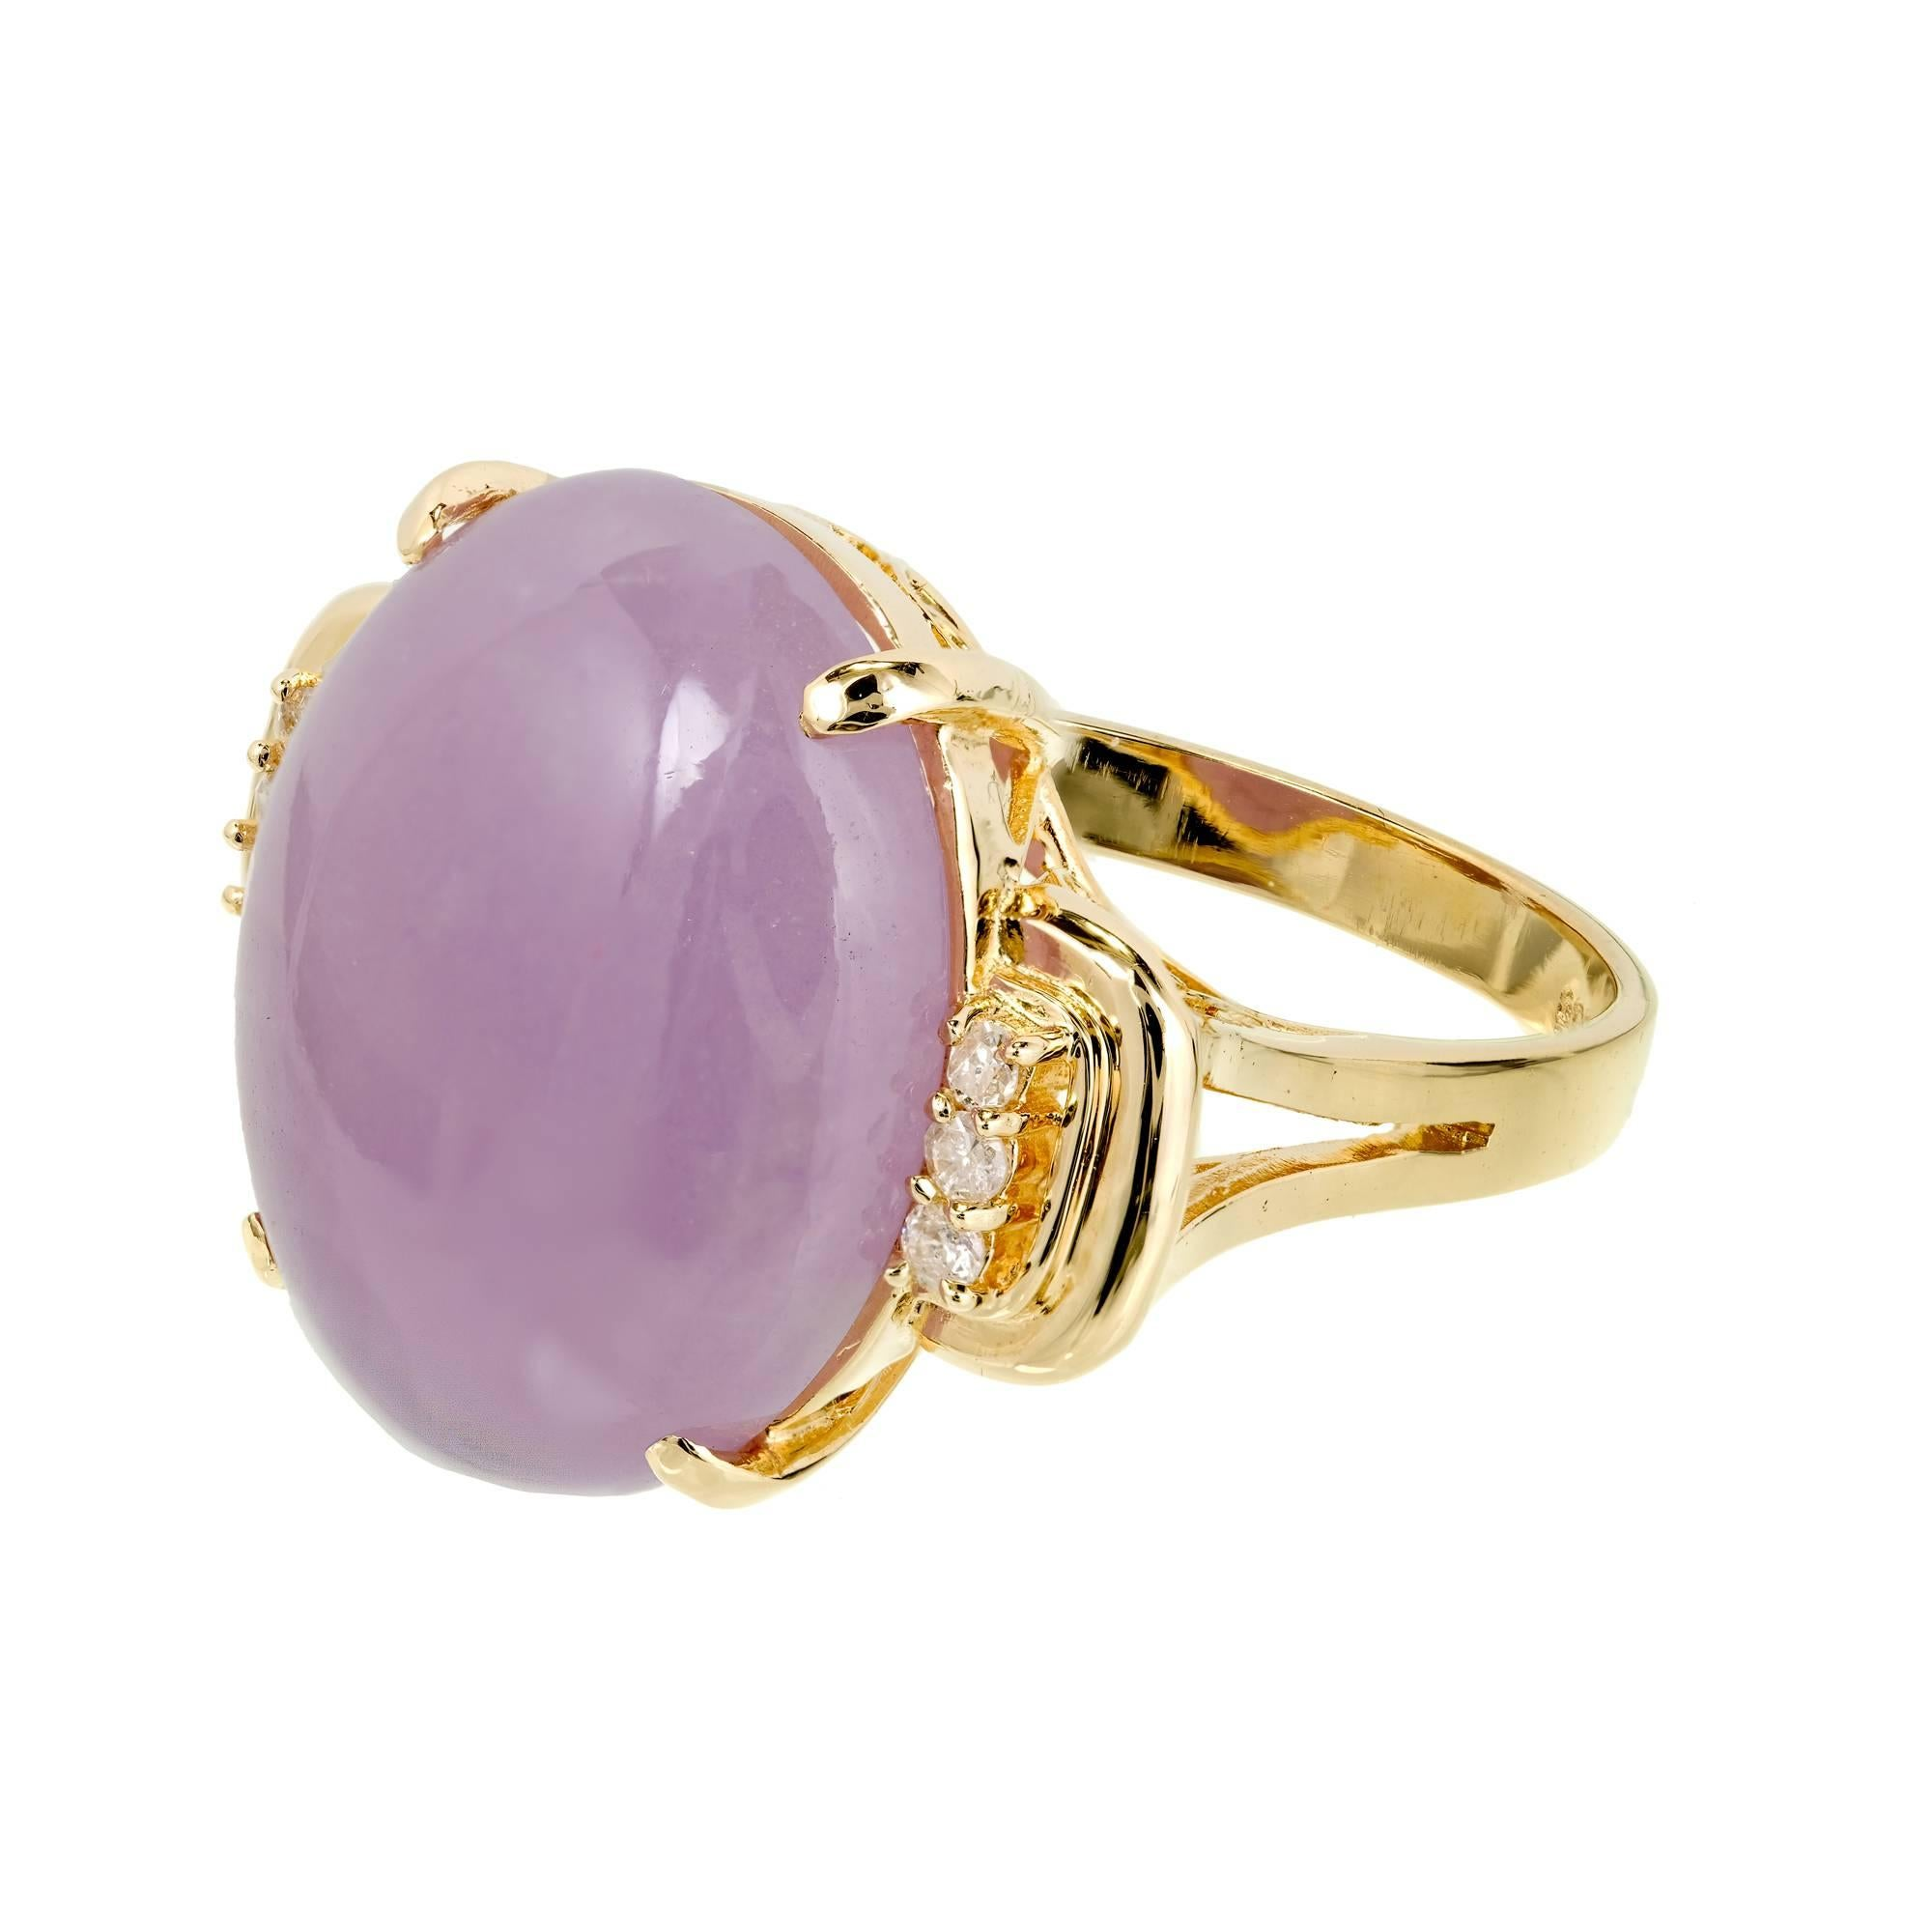 GIA Certified Natural Purple Jadeite Jade Diamond Gold Cocktail Ring